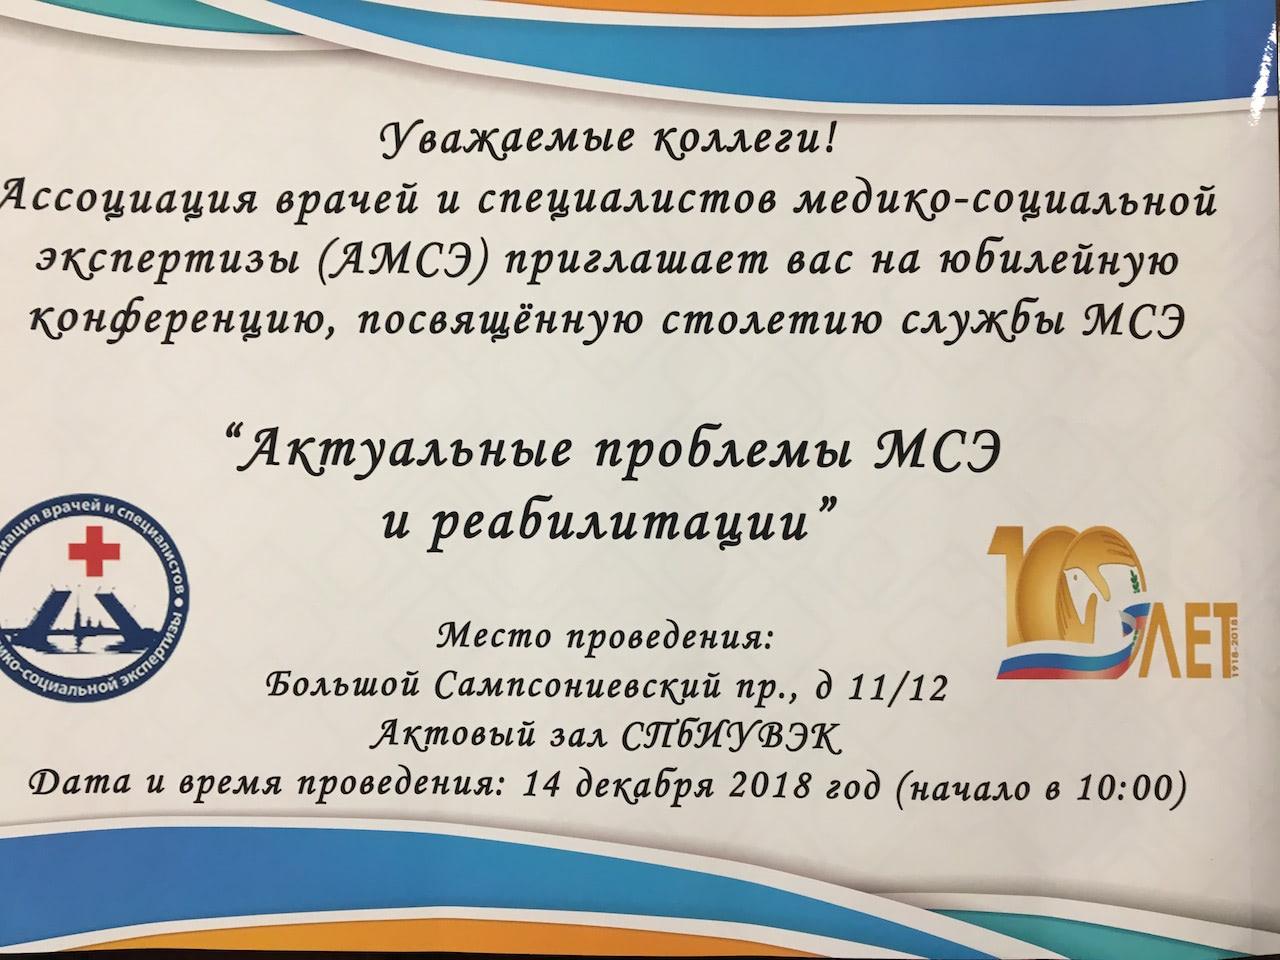 Конференция 100 лет МСЭ